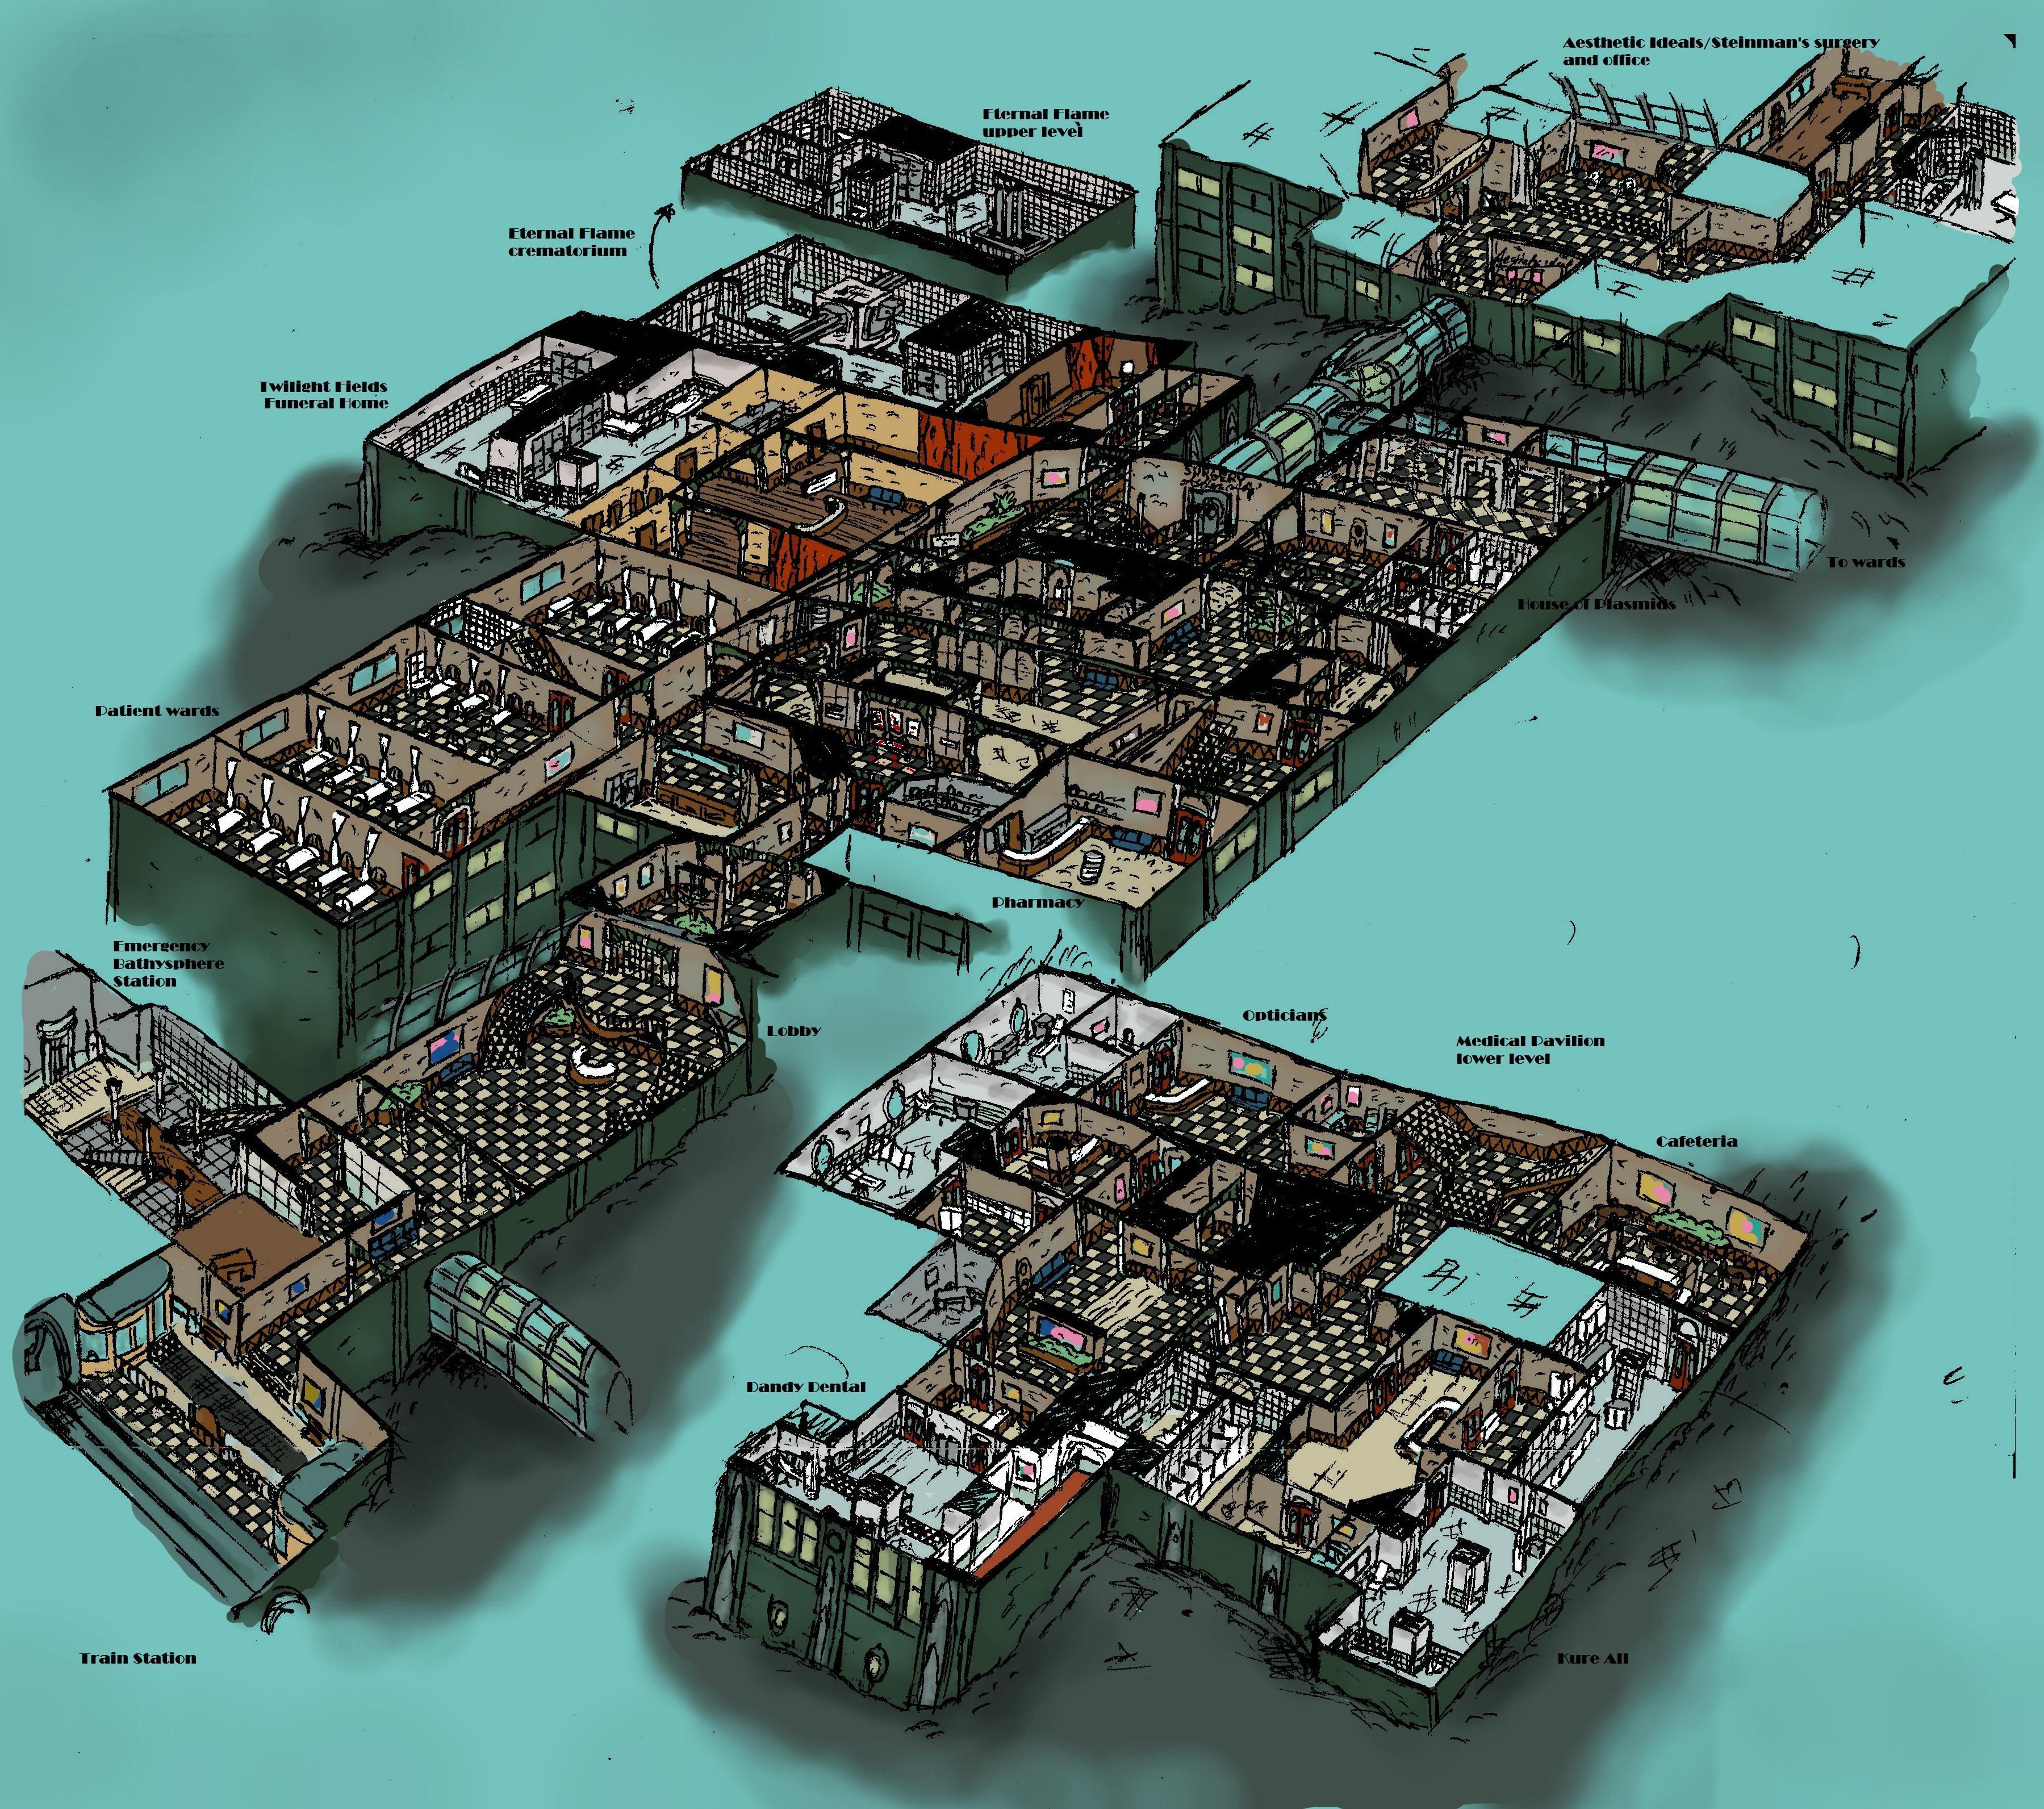 Rapture Medical Pavilion Cutaway Diagram By Hebbybobdige